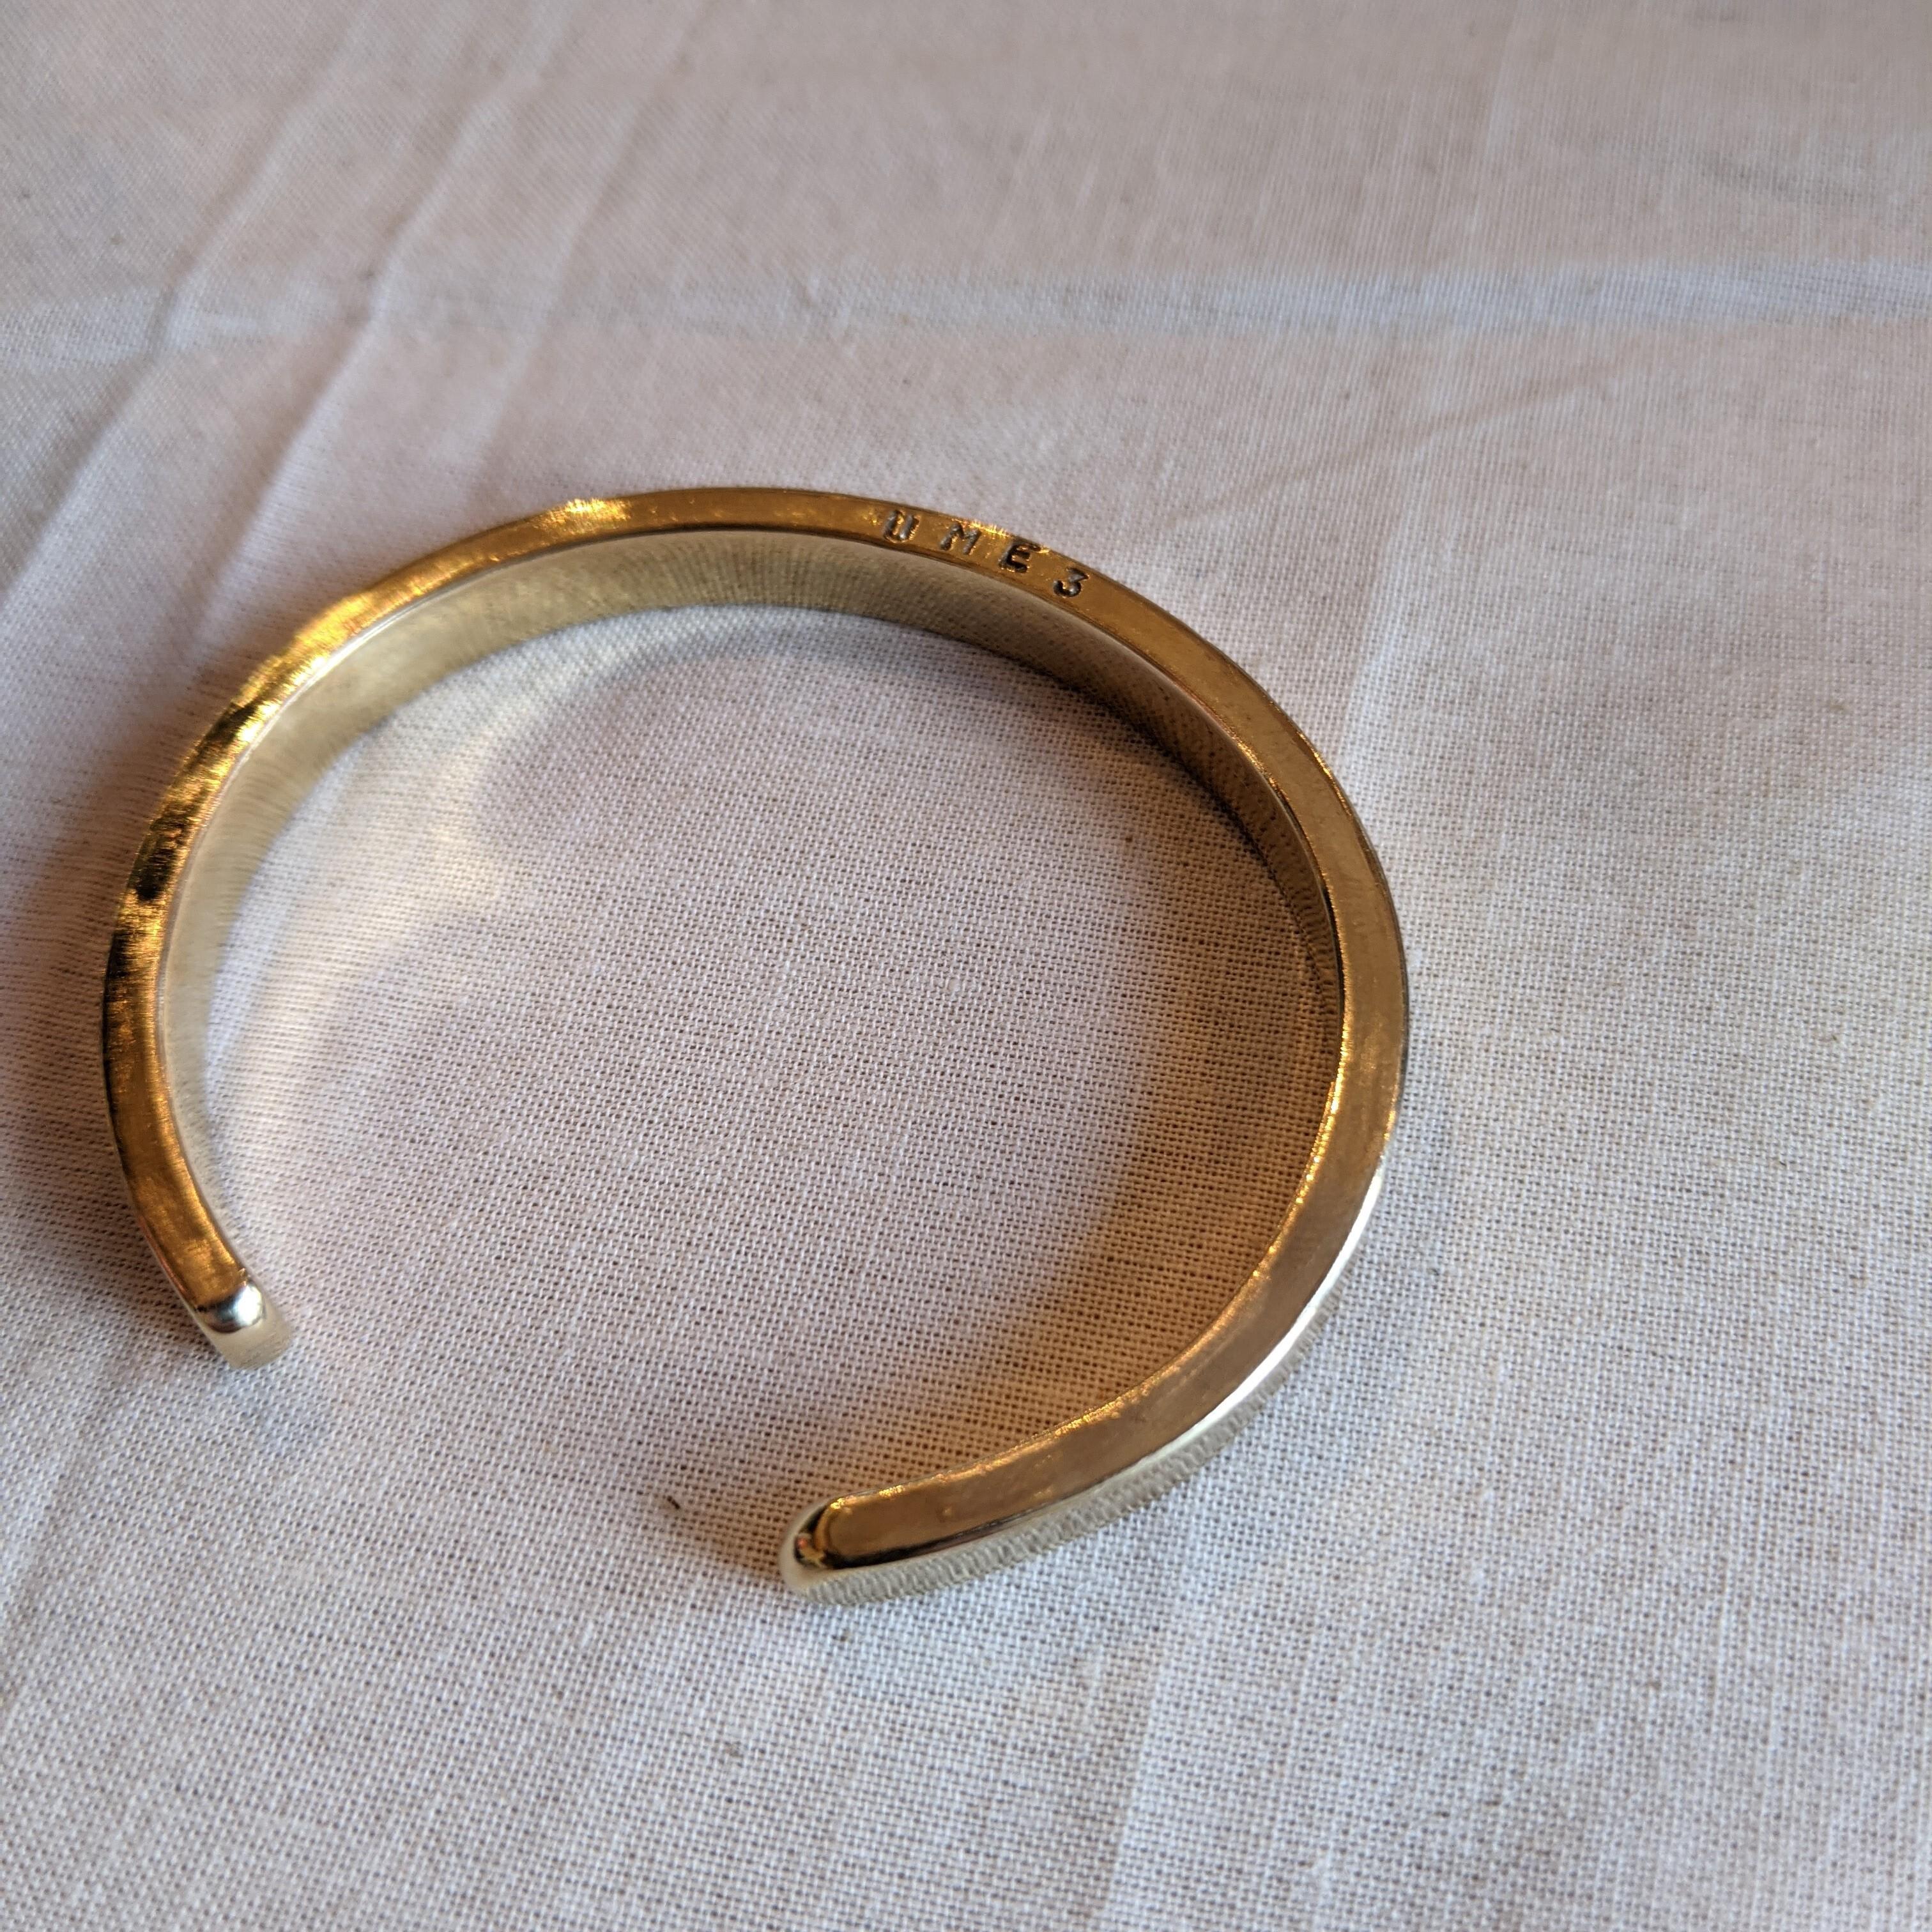 - ume 3rd anniversary special edition -【 jomathwich 】brass bangle / B-10 真鍮バングル / ume刻印